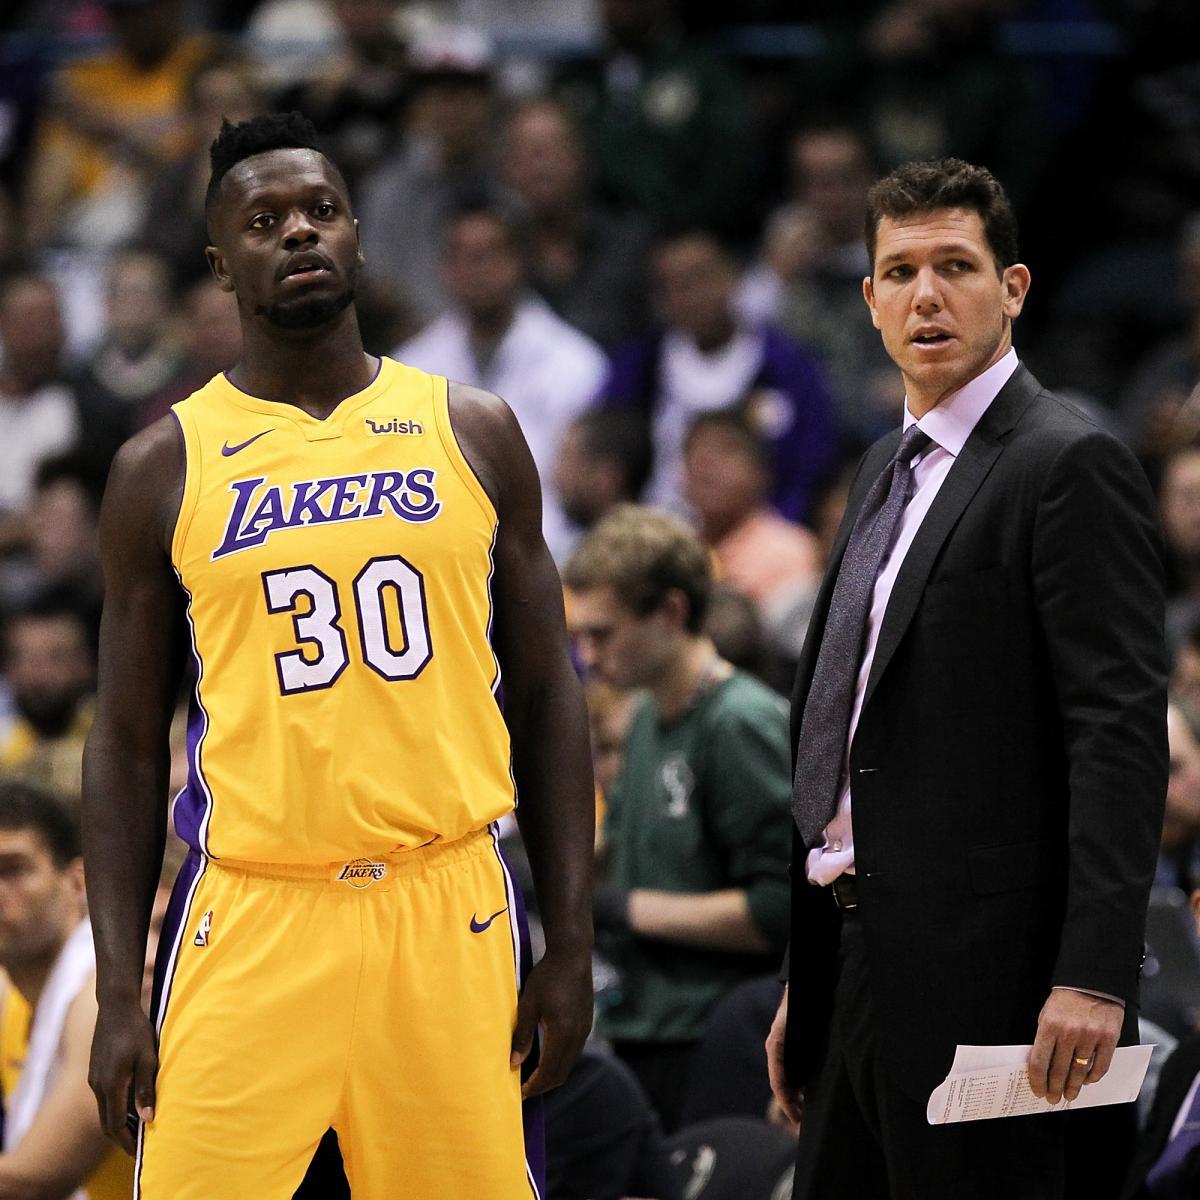 Lakers News: Luke Walton 'Not Up at Night Wondering' About Julius Randle's Exit